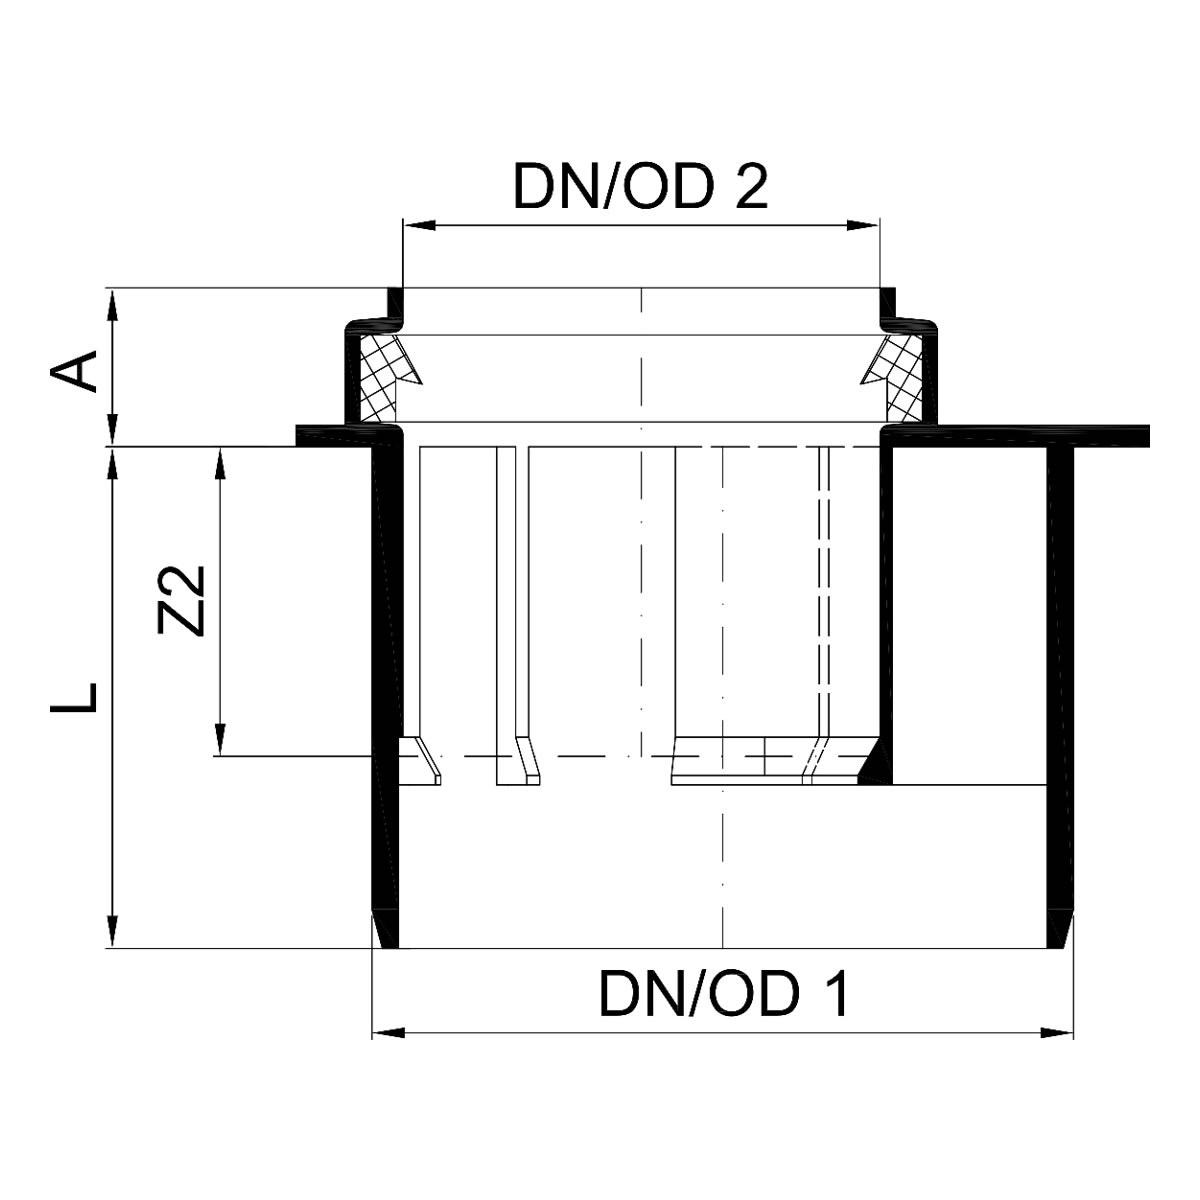 Famous POLO-KAL NG Abfluss-Übergangsrohr kurz mit Muffe - DN 110 / 50 AG96